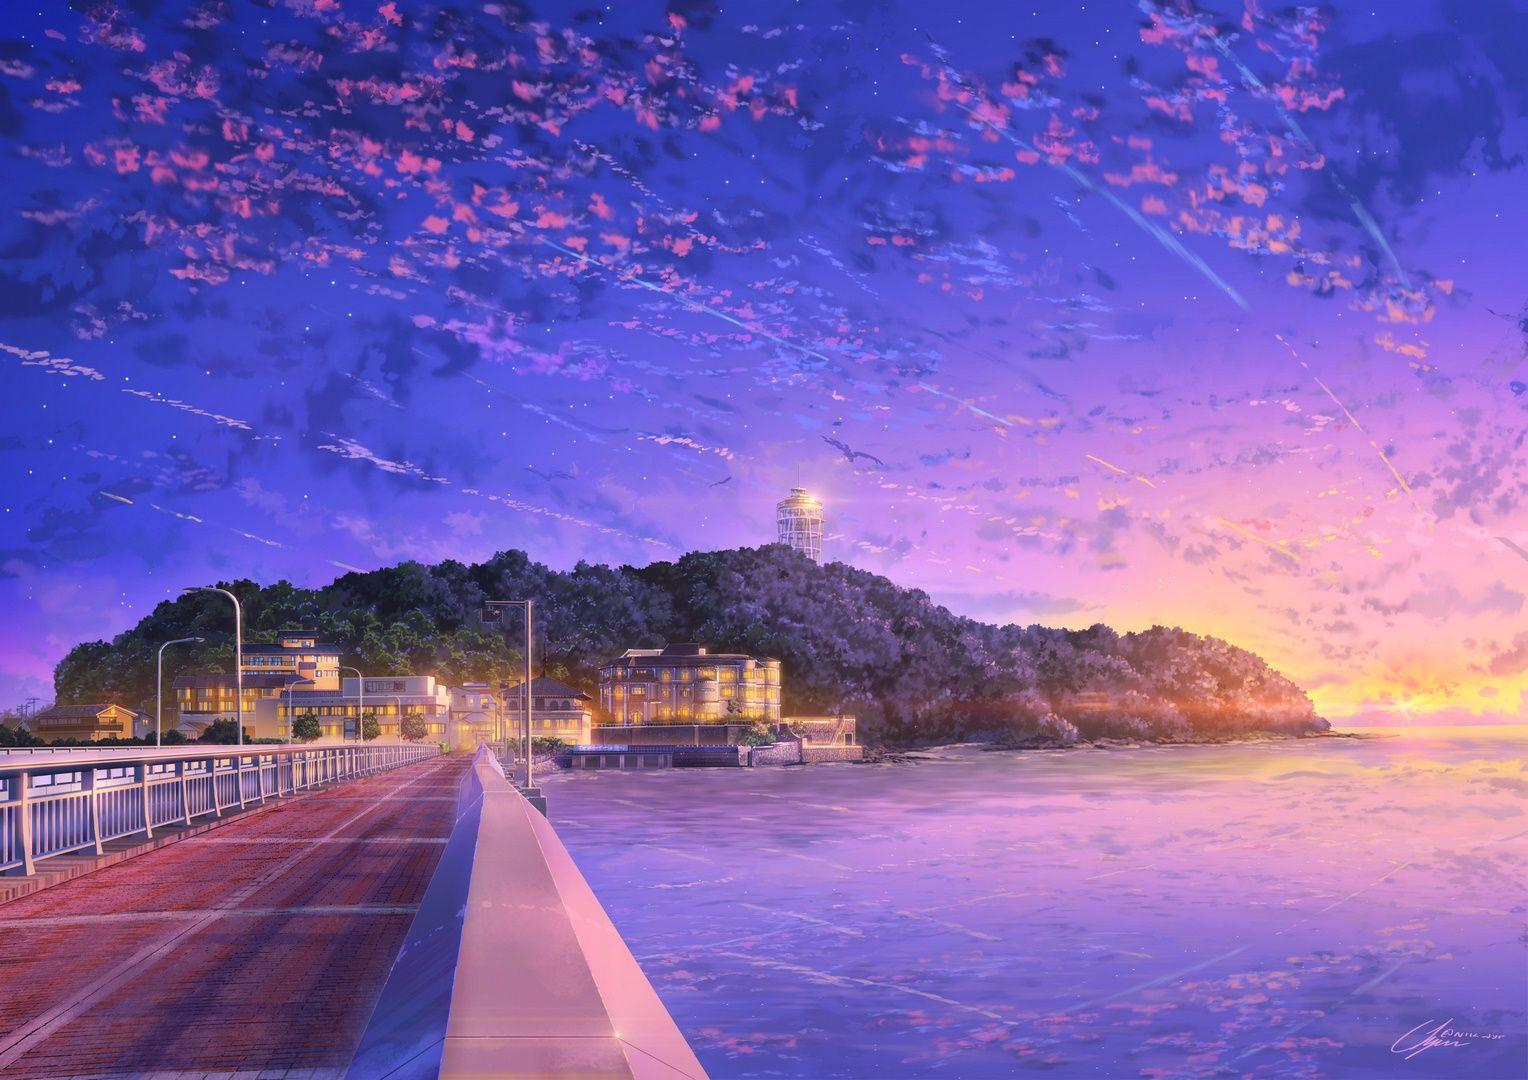 Japan Anime Sky 4k 3k Go Wallpapers Wallpapers Background Wallpaper Hd Original Resolution Down In 2020 Scenery Wallpaper Anime Backgrounds Wallpapers Anime Scenery